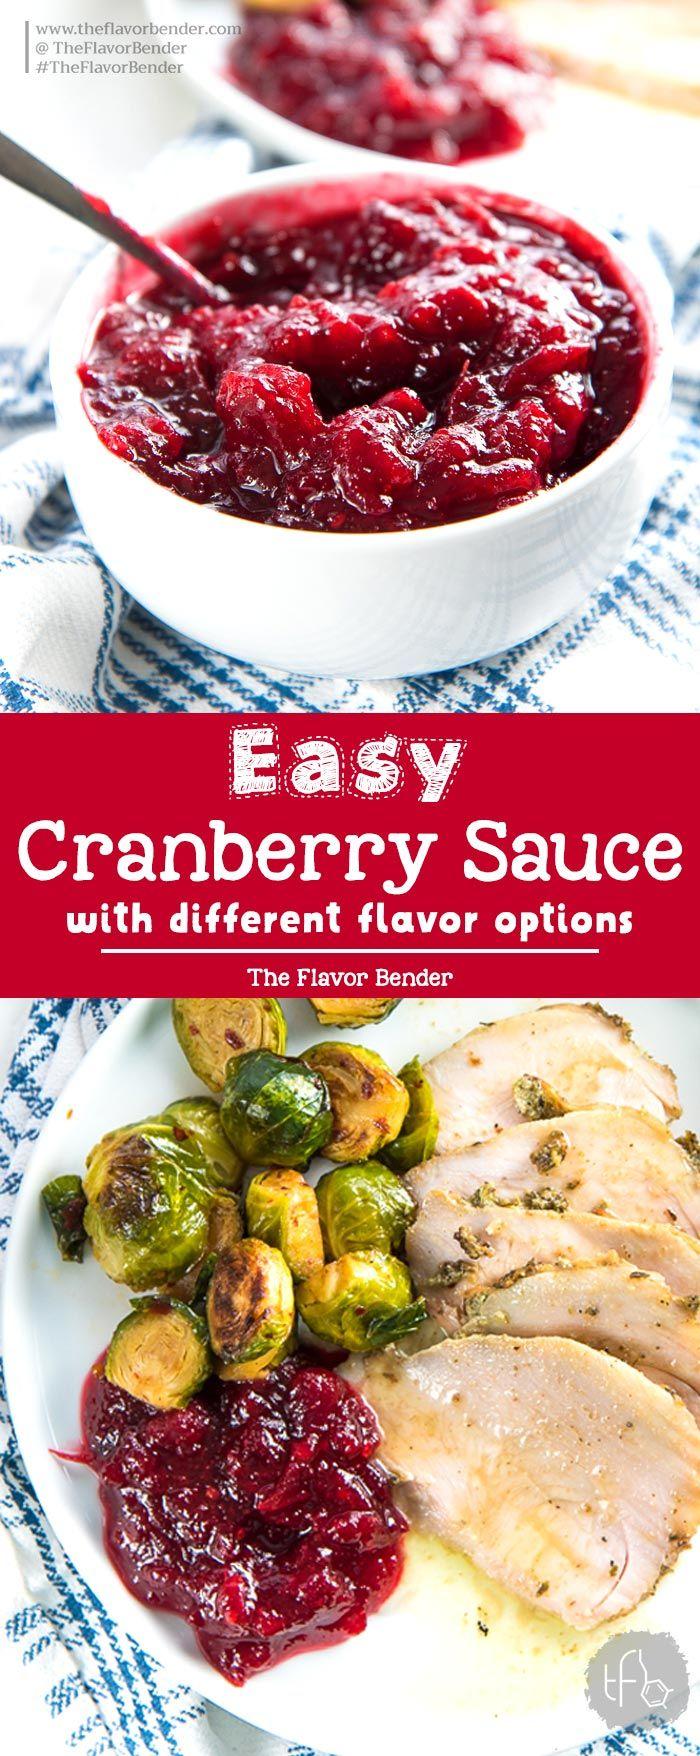 Versatile and Easy Cranberry Sauce - The Flavor Bender #cranberrysauce